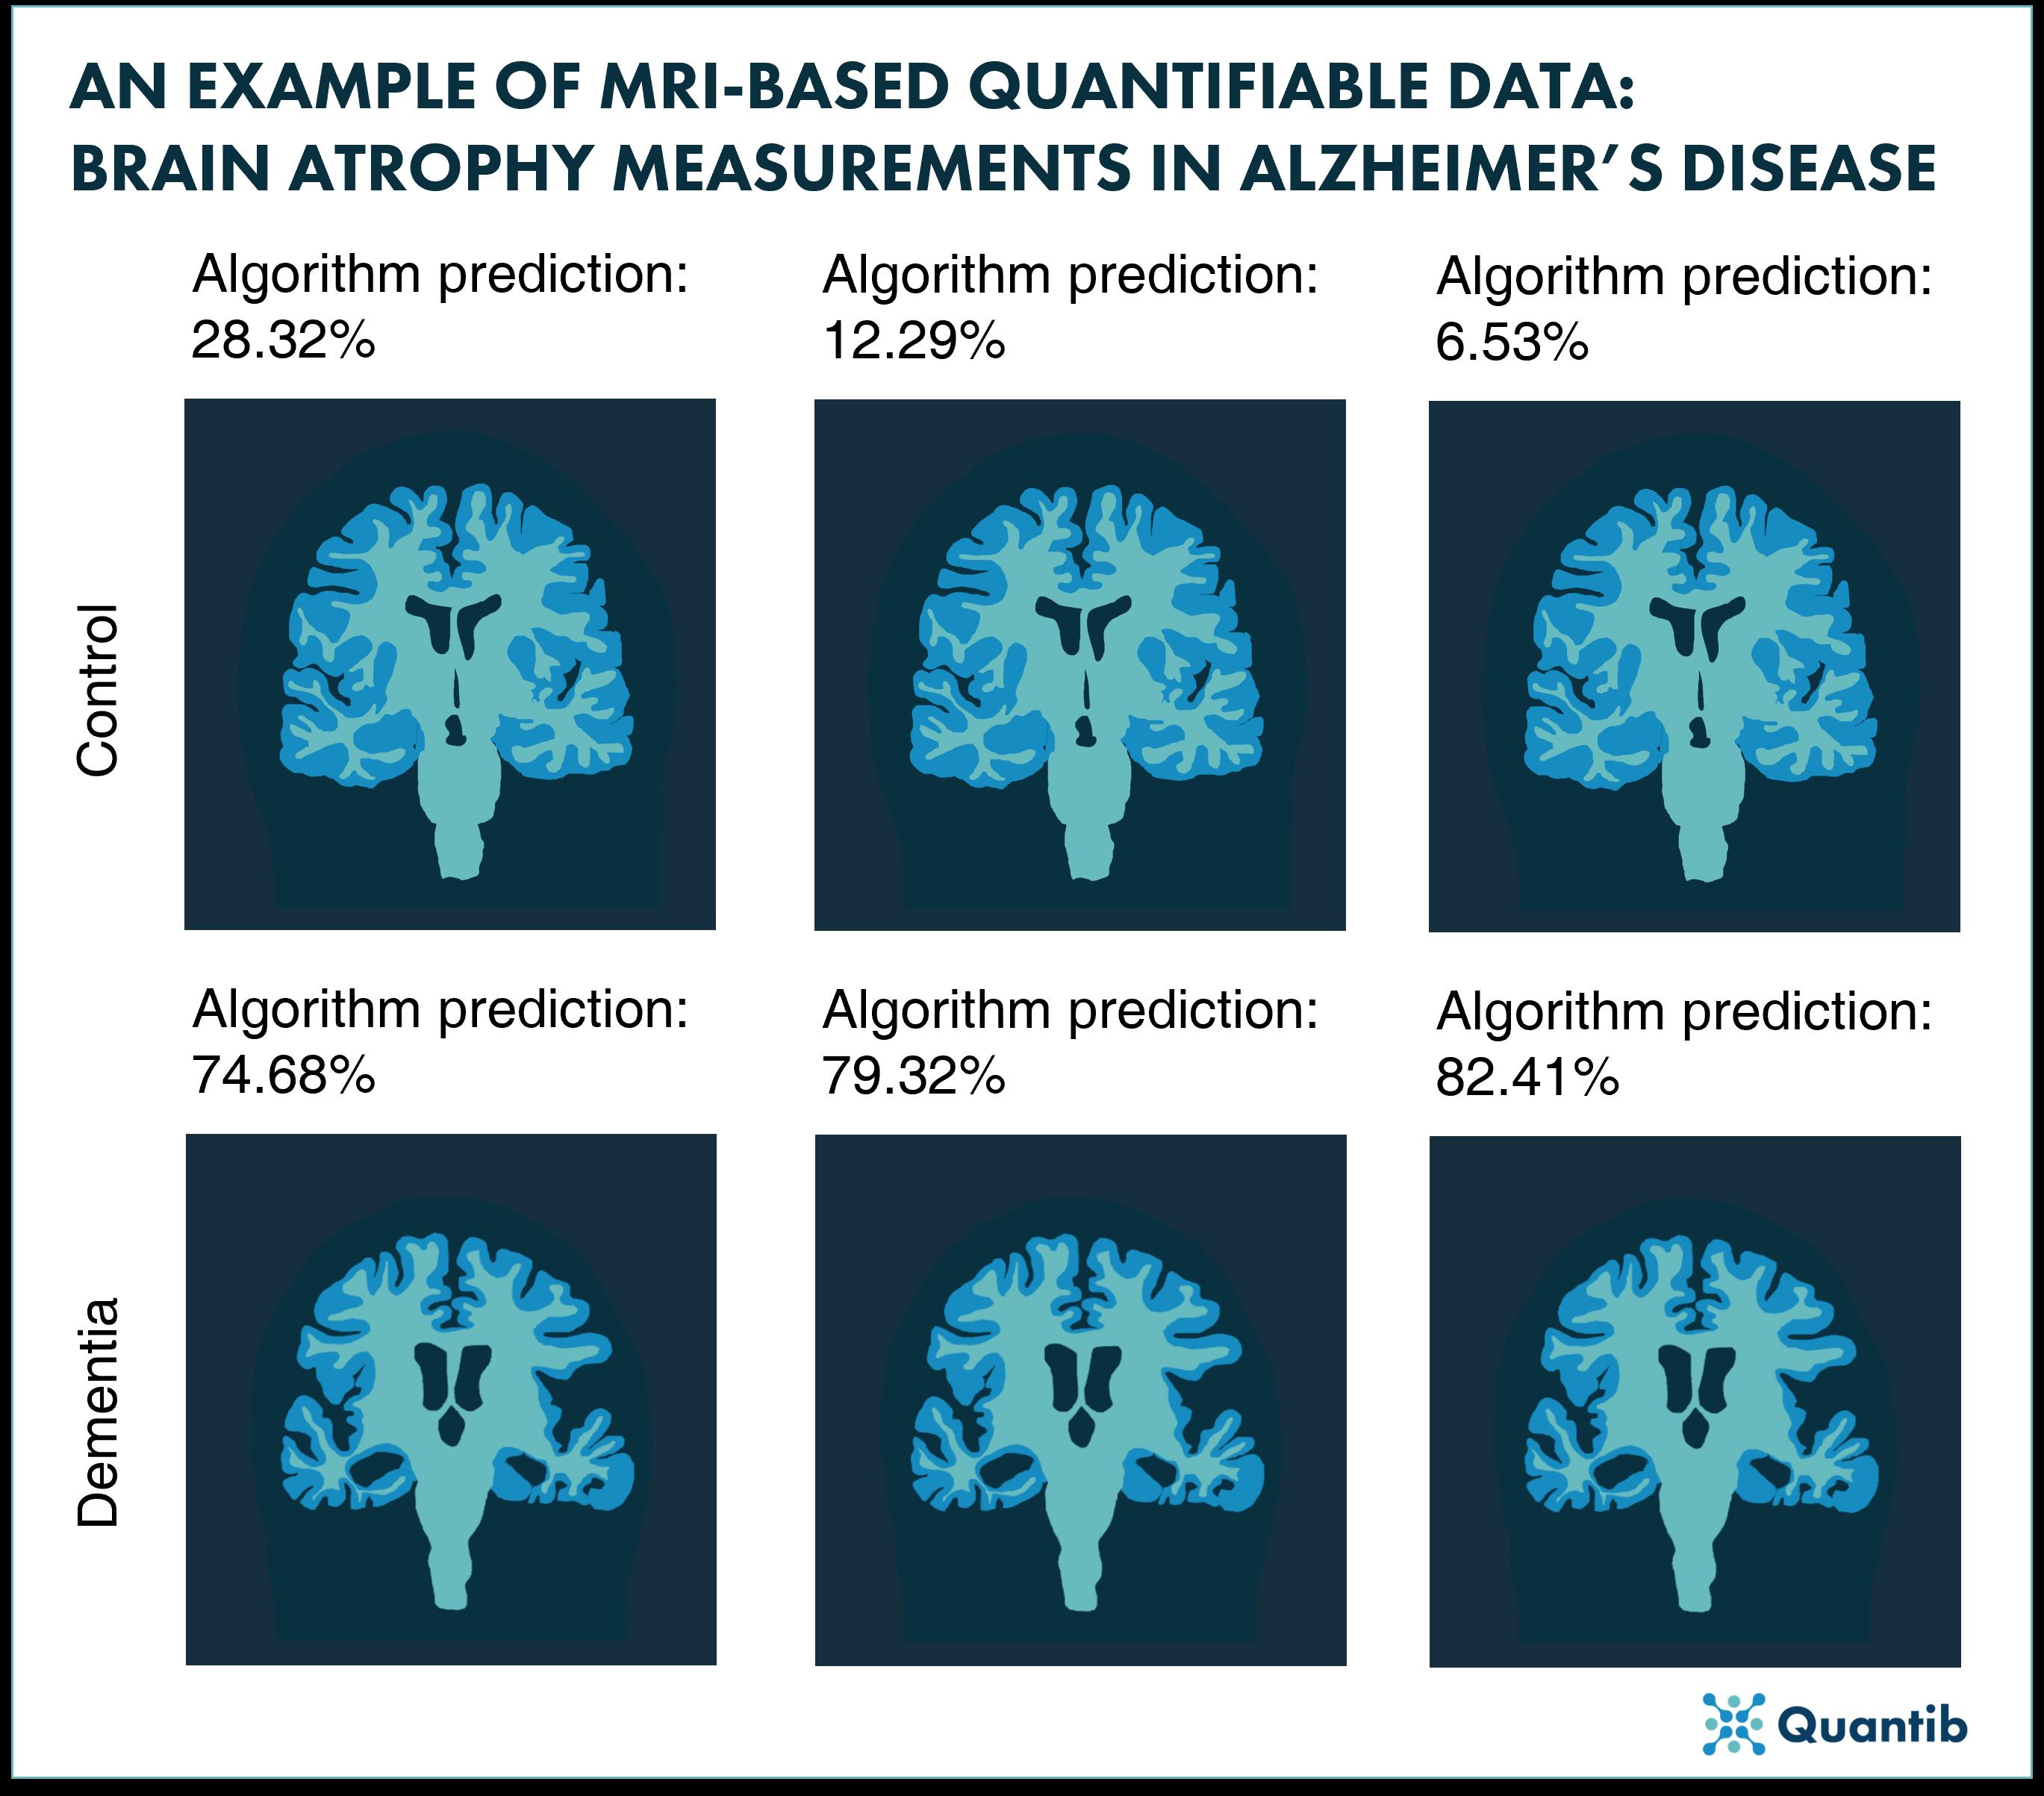 Brain atrophy measurements in Alzheimer's disease